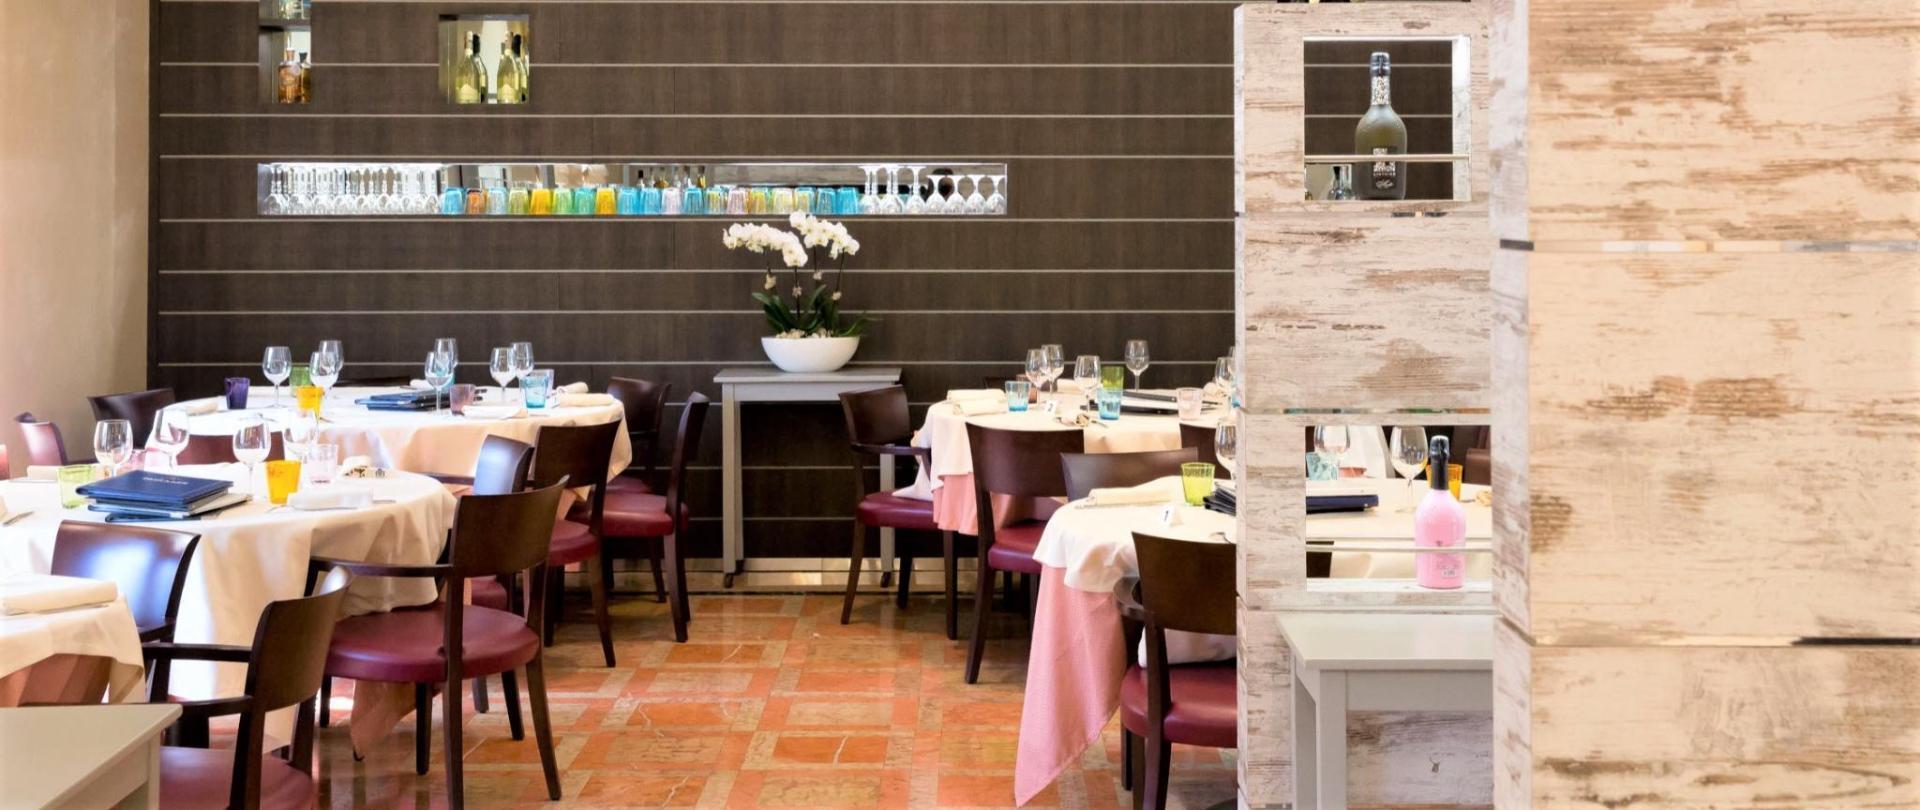 ristorante 2.jpg